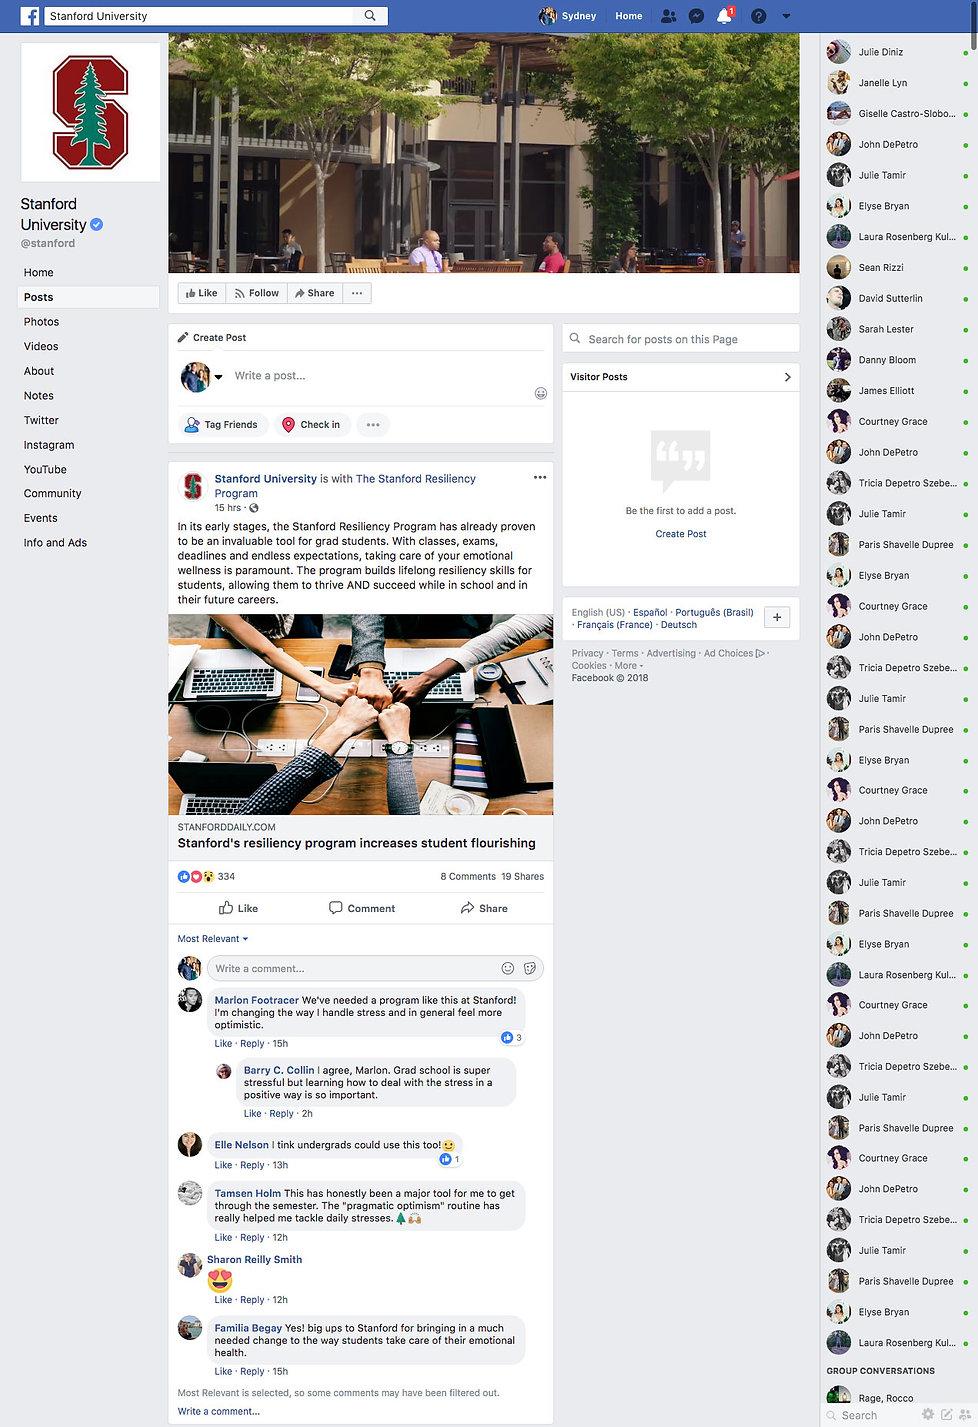 Stanford-Facebook-Press-Post1.jpg